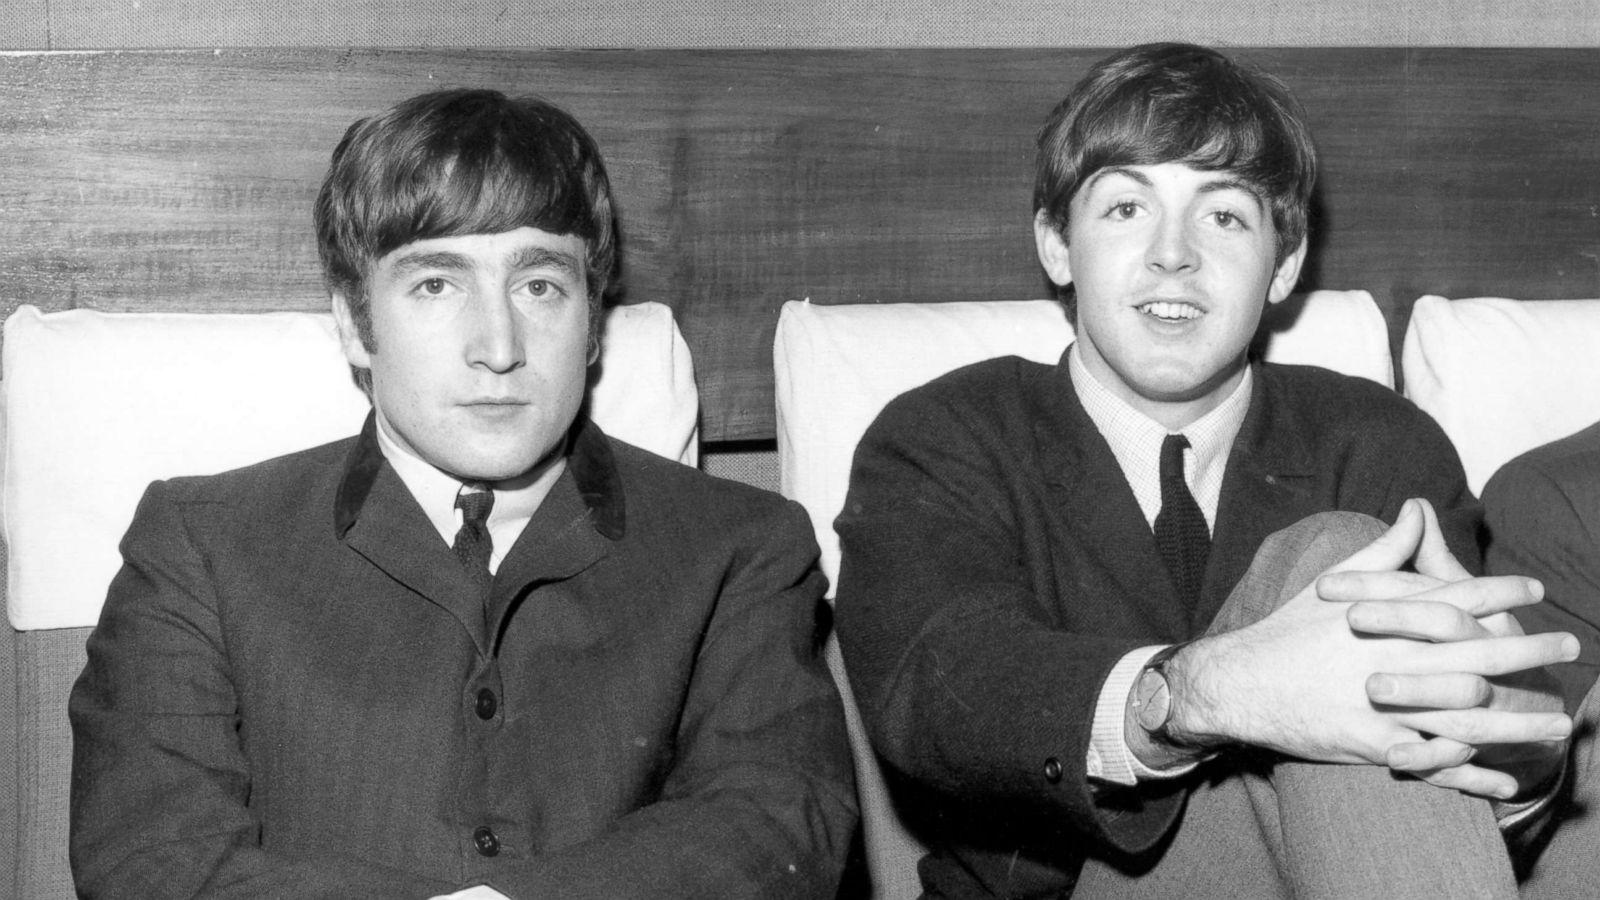 John Lennons Son Sean Posts Photo With Paul McCartneys James